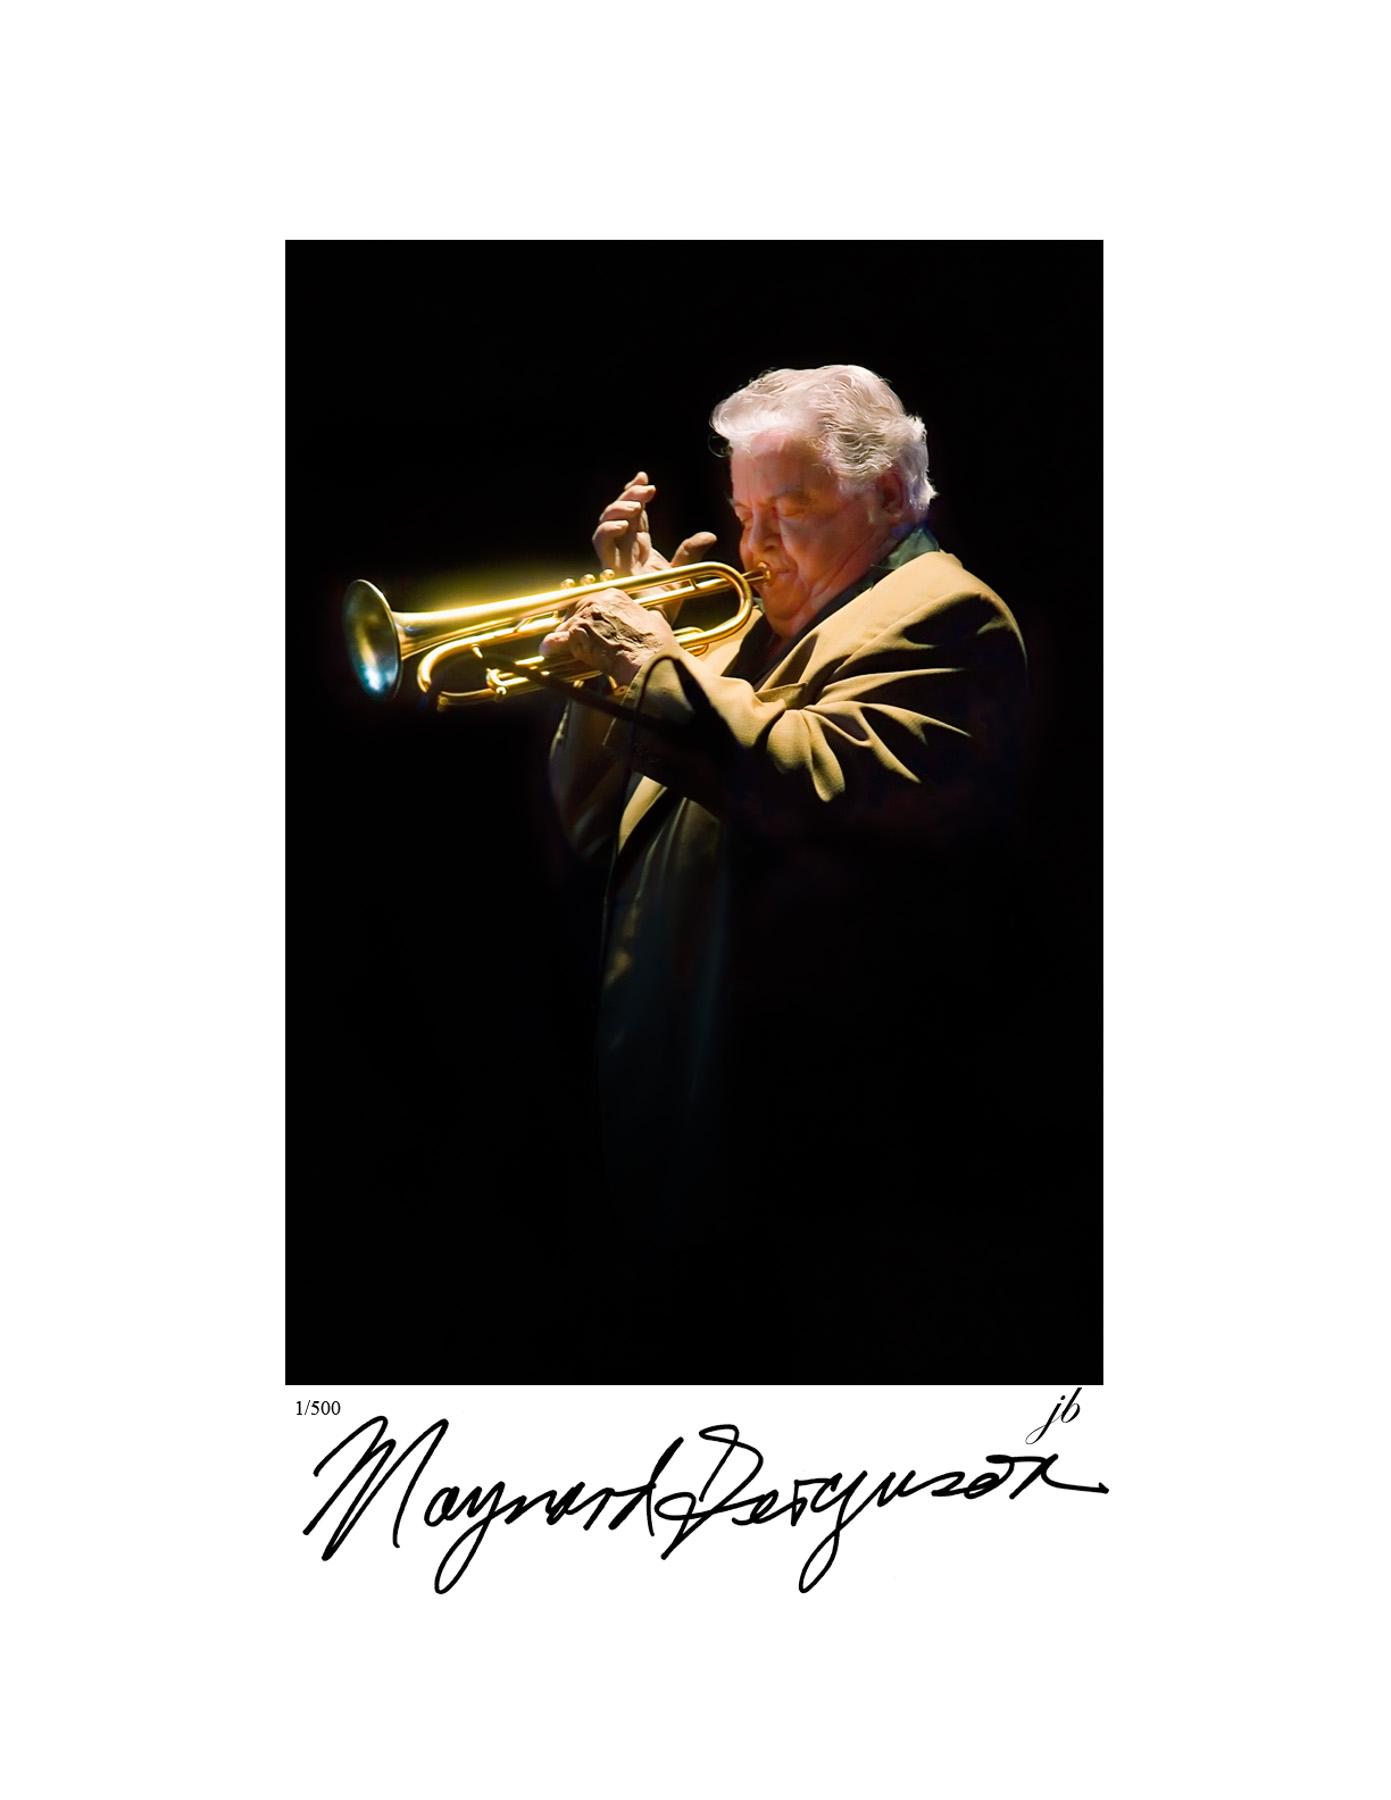 Maynard Liminted 11x14